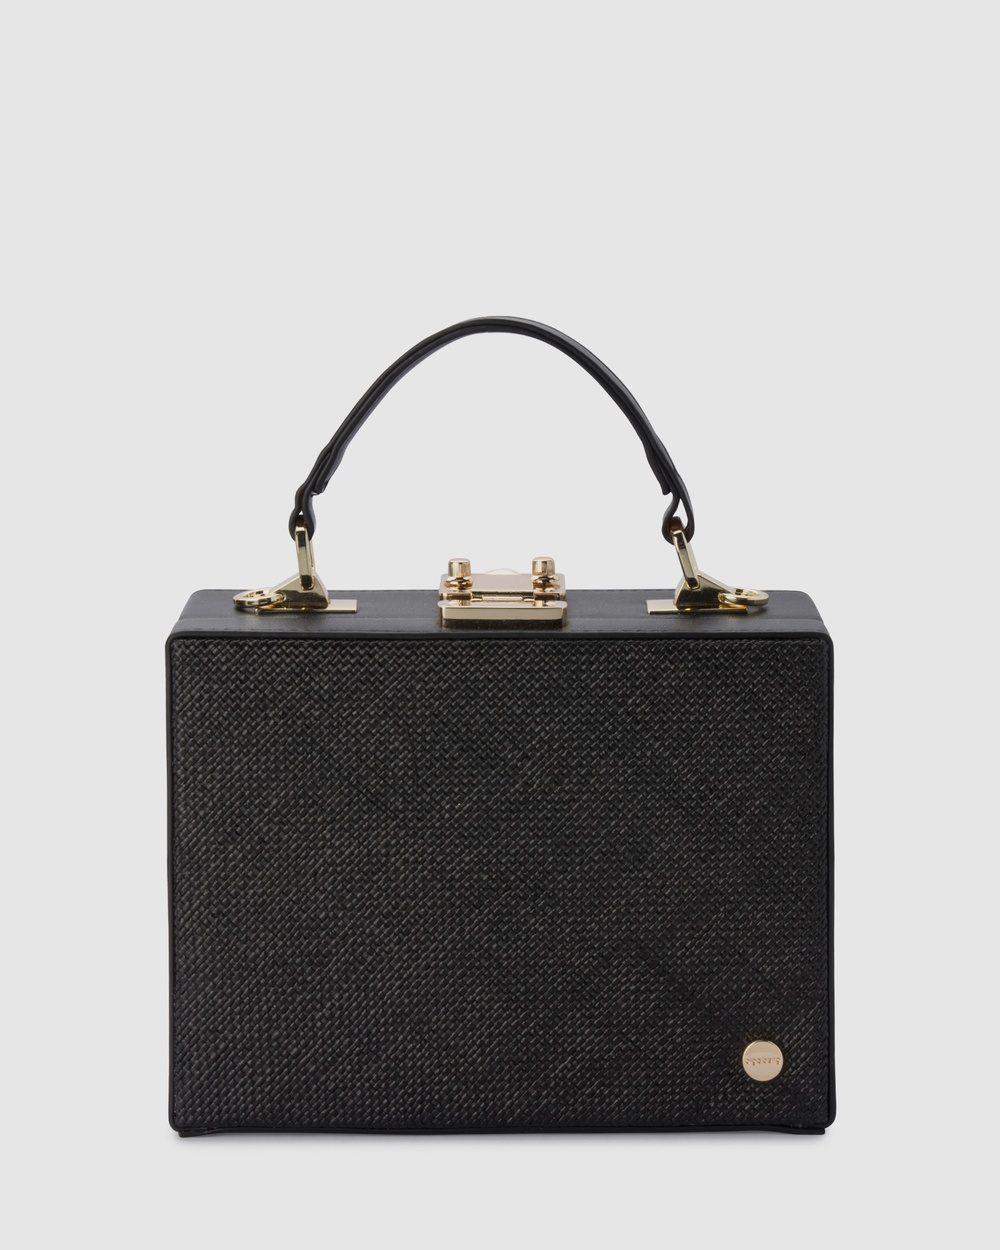 Olga Berg Georgia Straw Weave Top Handle Handbags Black Handbags Australia